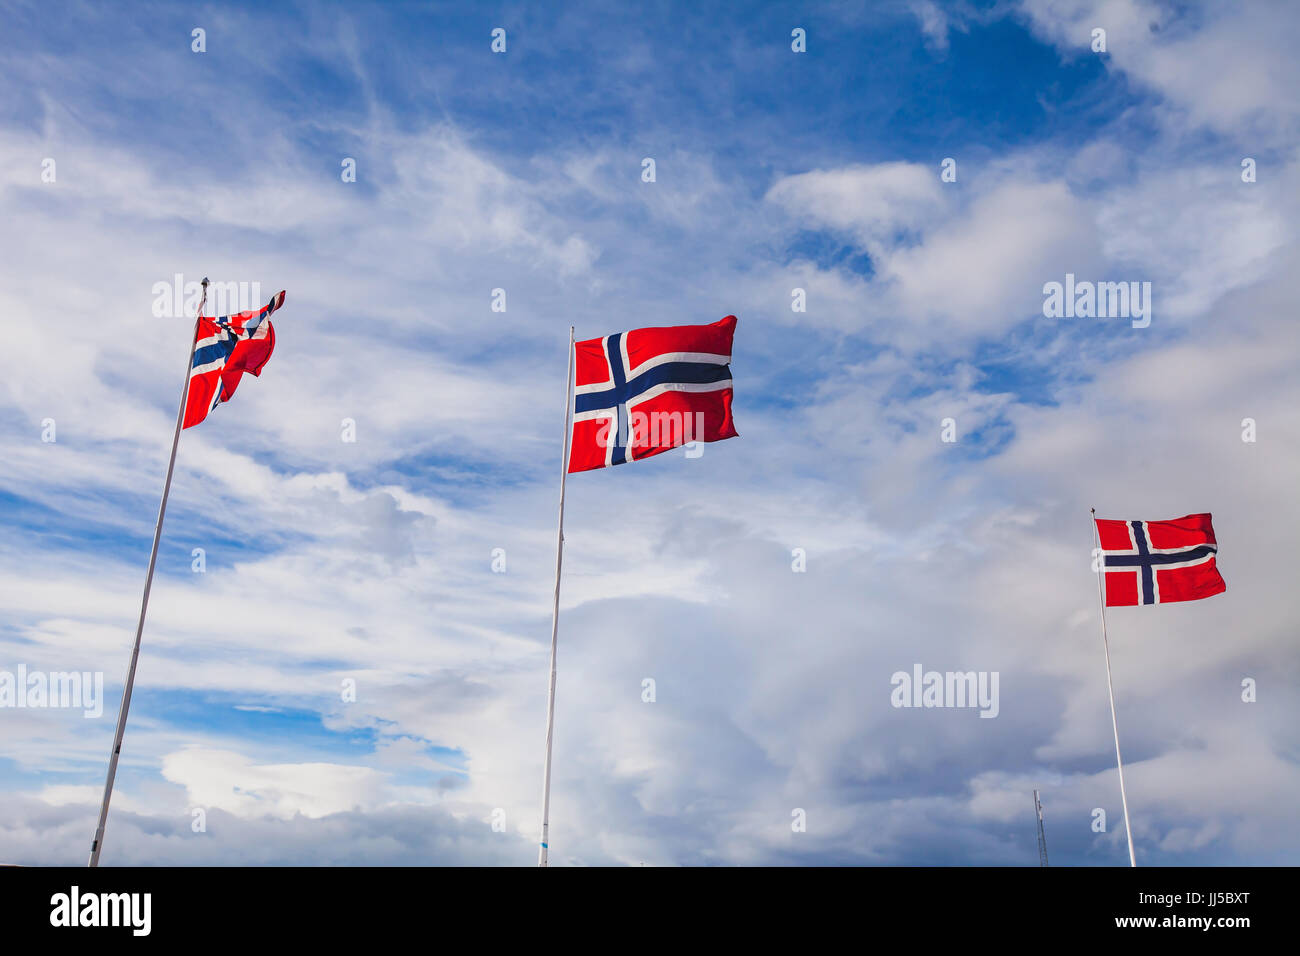 Norway, norwegian flags waving on blue sky background - Stock Image